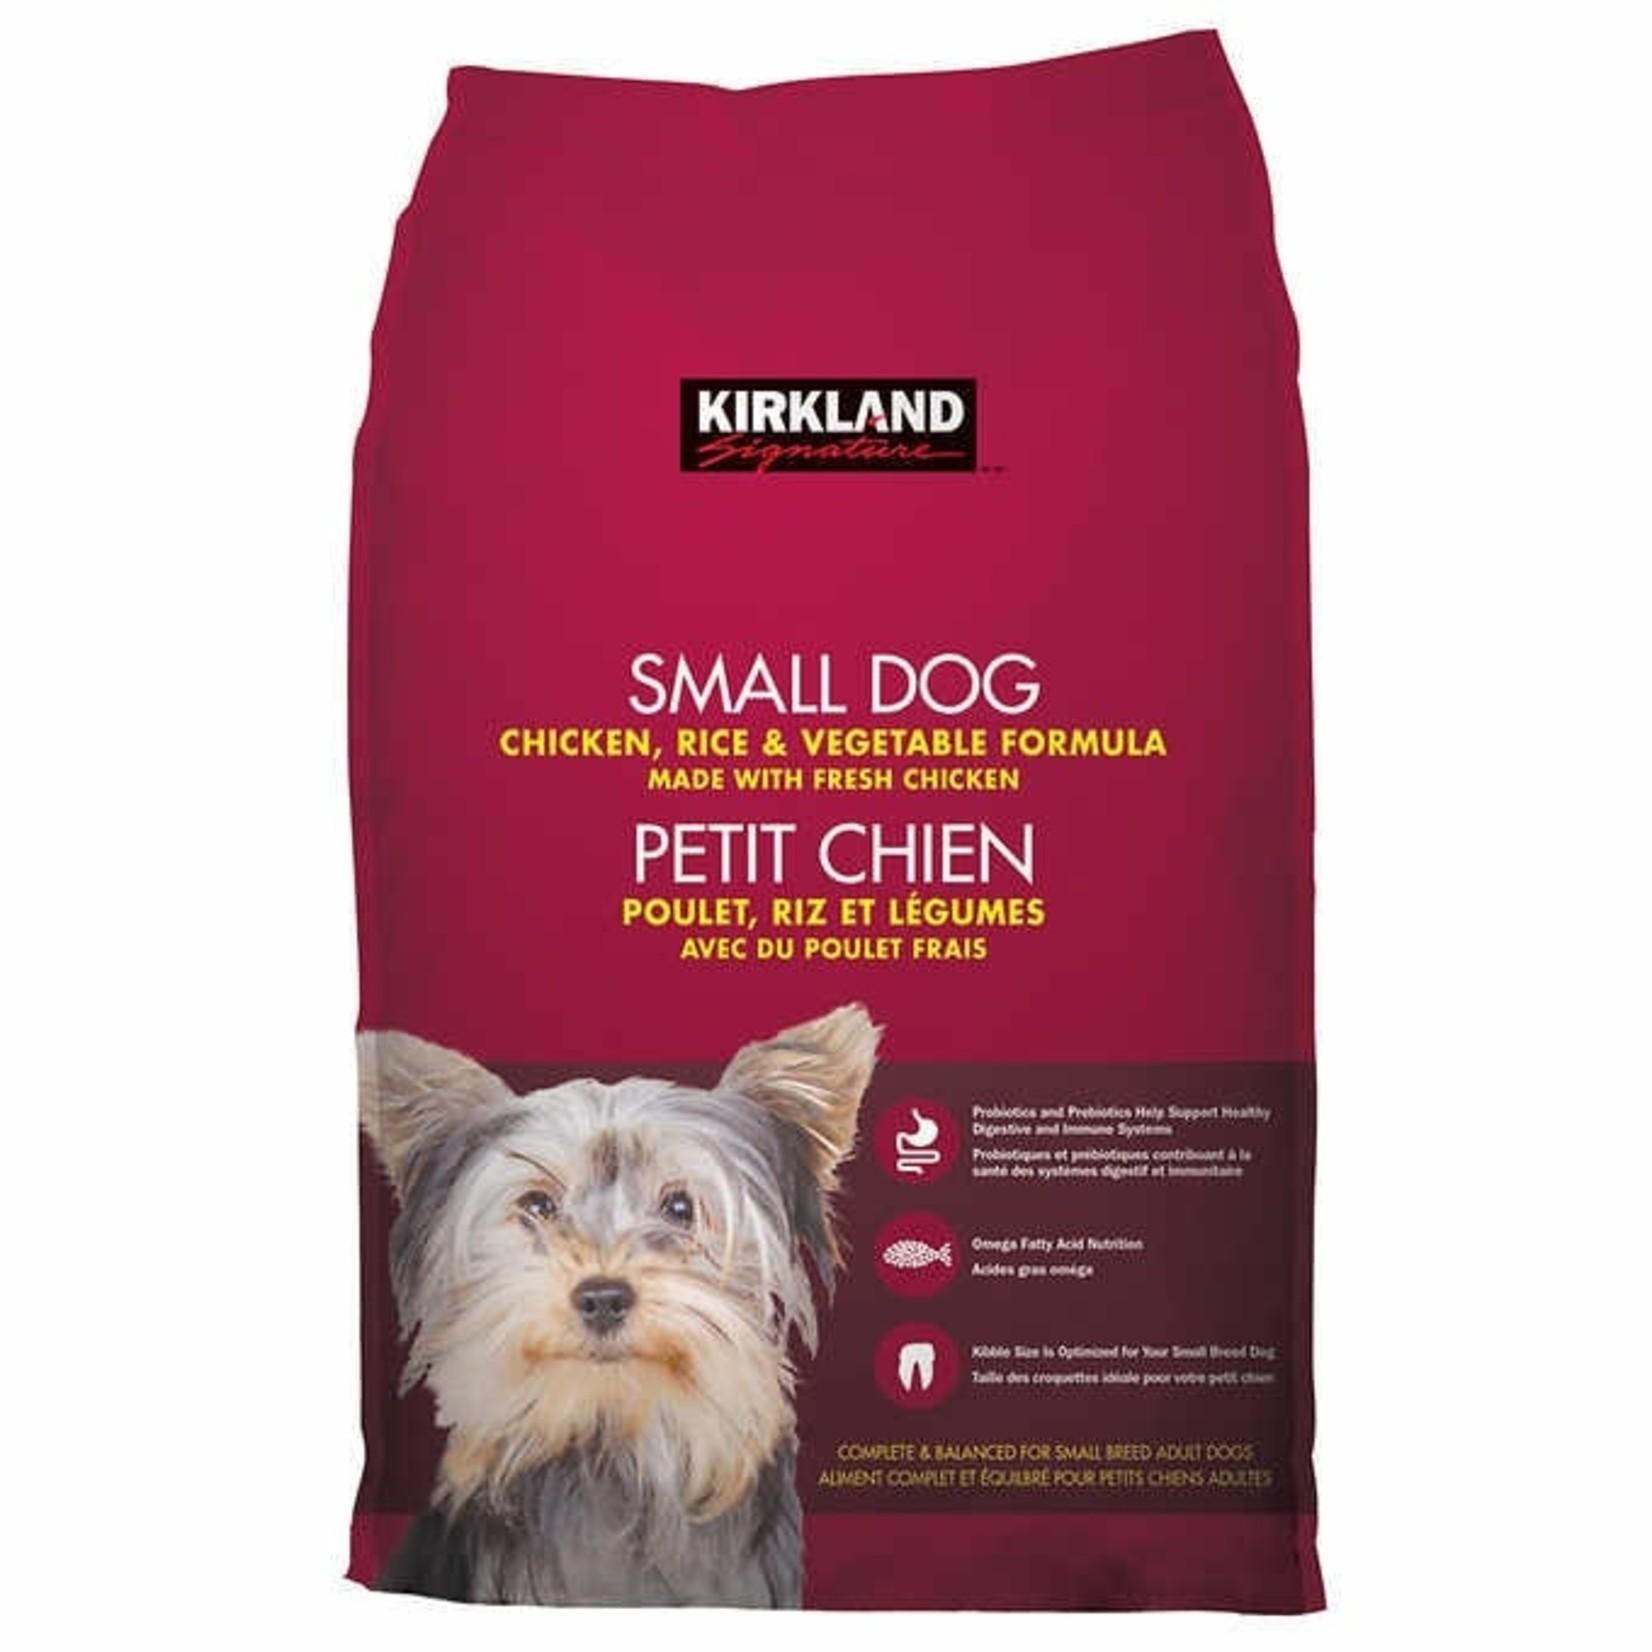 Kirkland Signature Small Dog Chicken Rice & Vegetable Formula 9.07kg